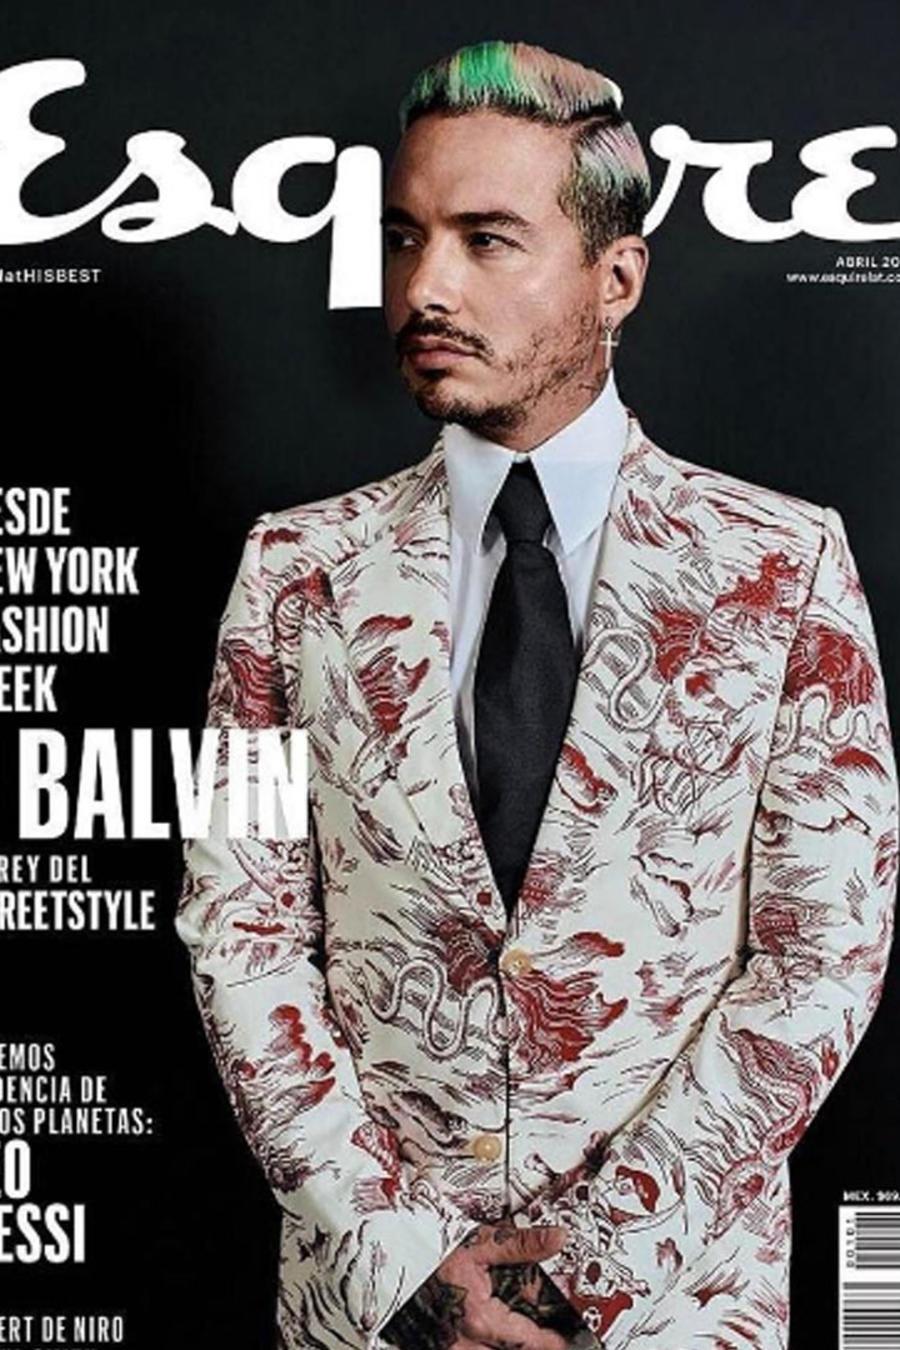 jbalvin portada esquire